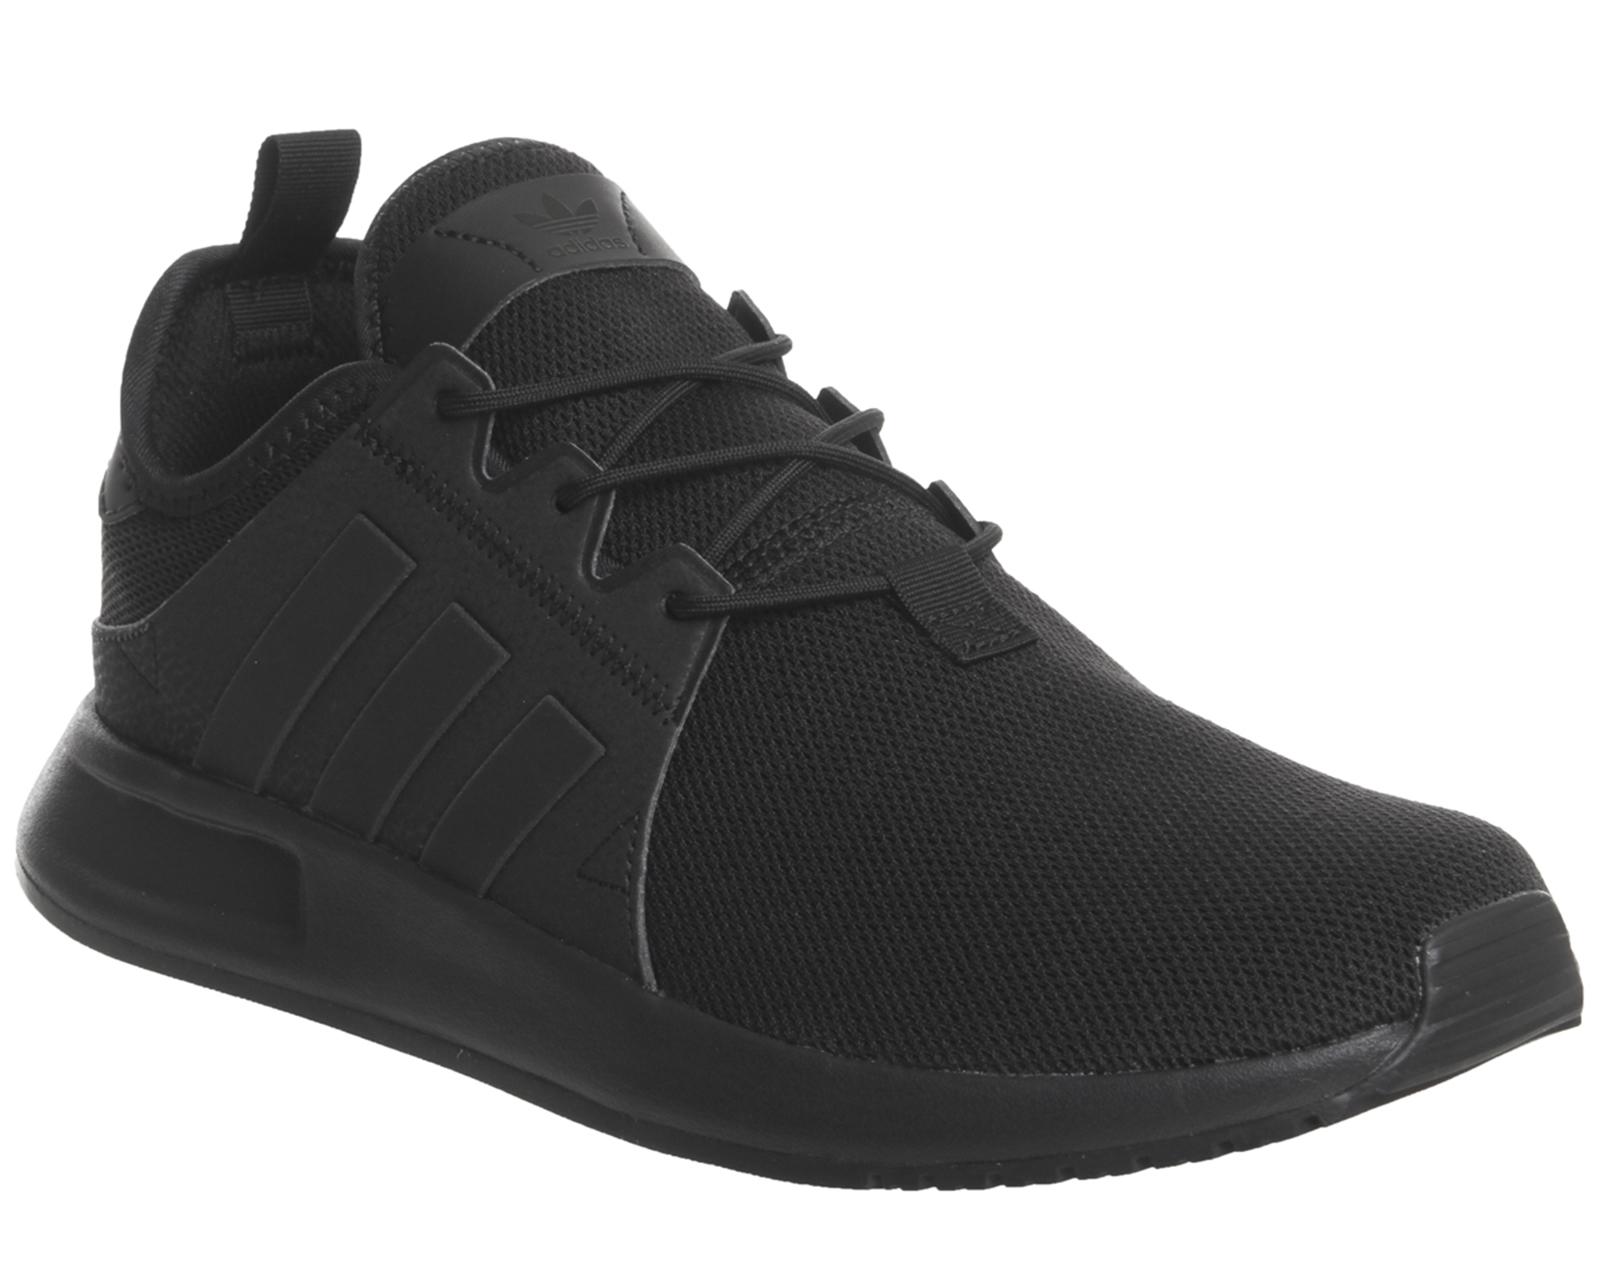 low cost 26433 cddc9 Sentinel Adidas X Plr Black Mono Trainers Shoes